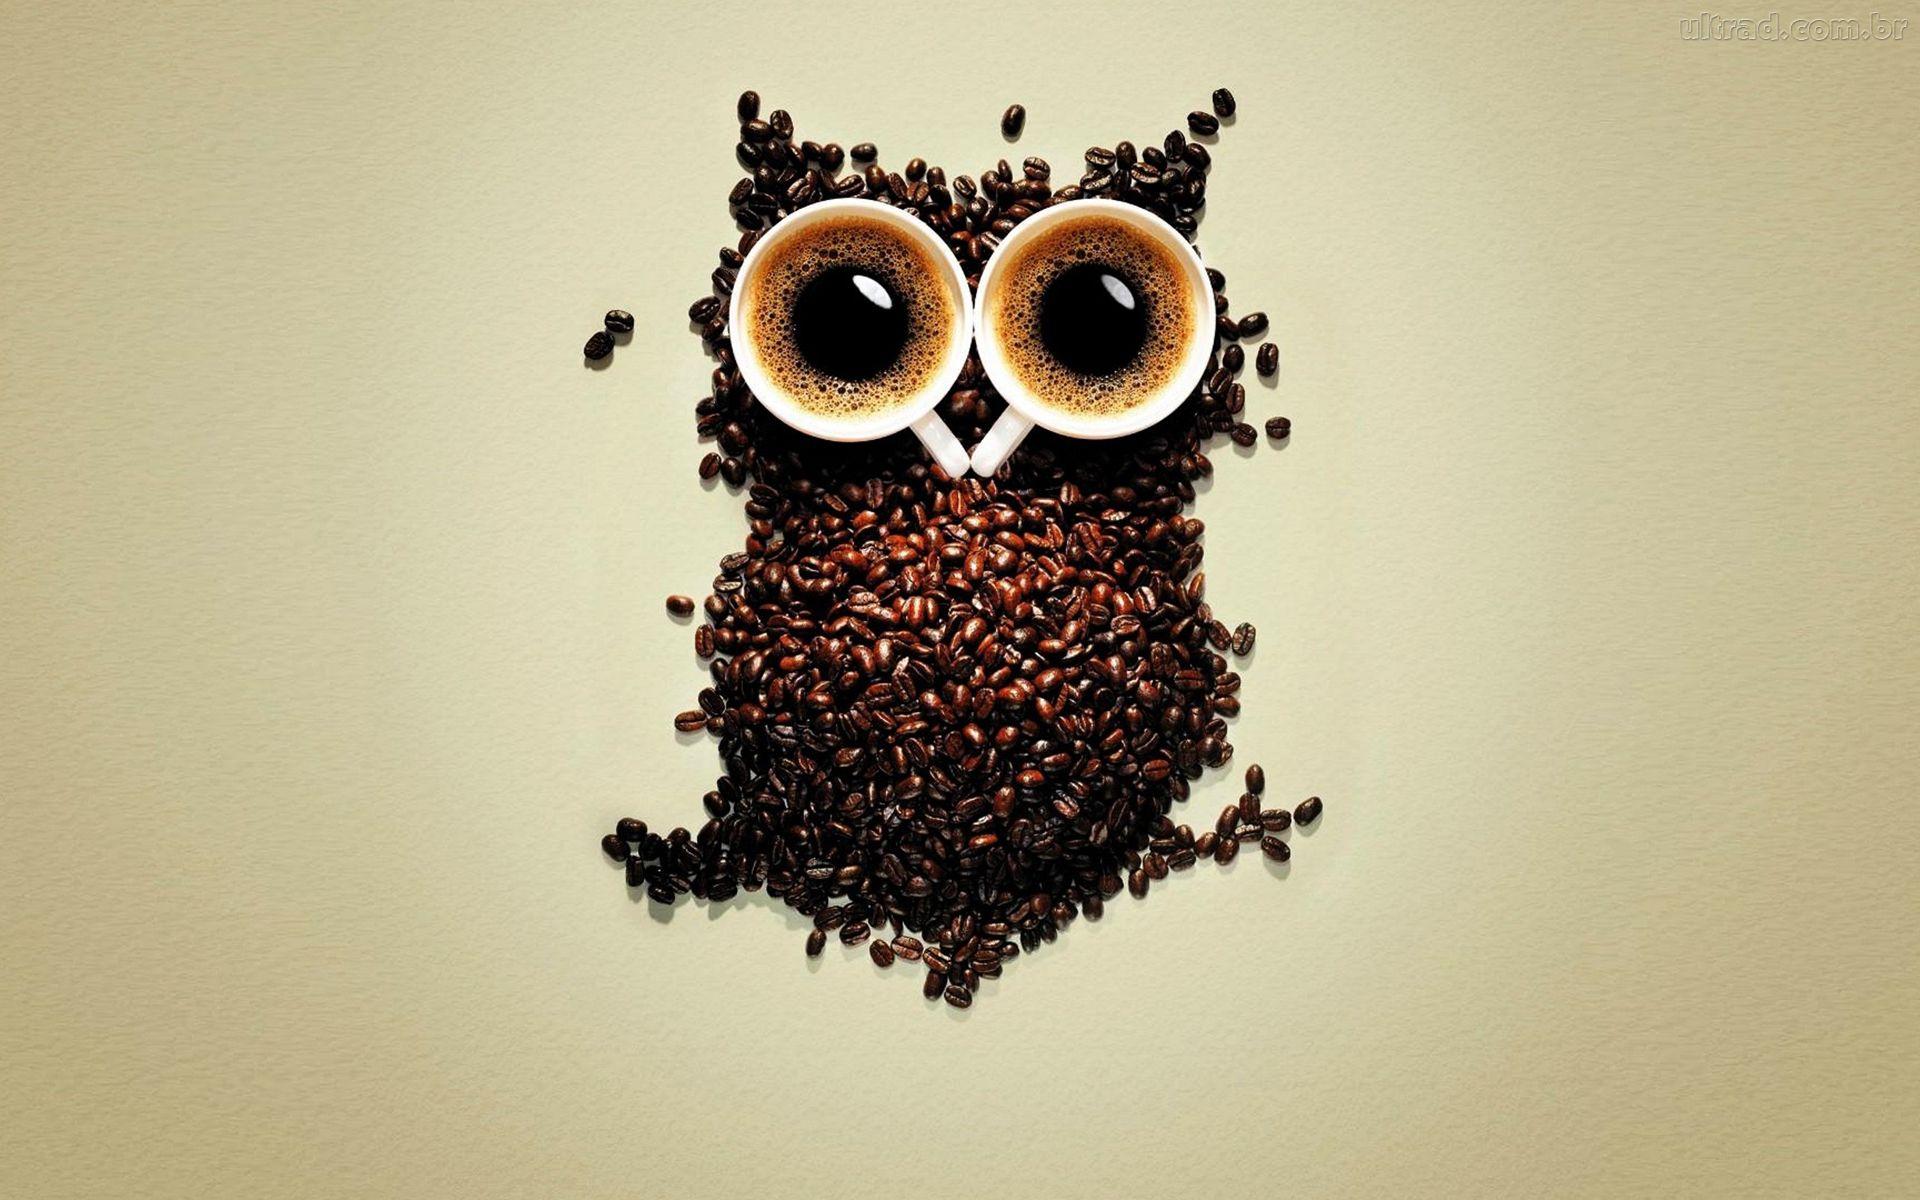 Owl-Wallpaper-Design-Free